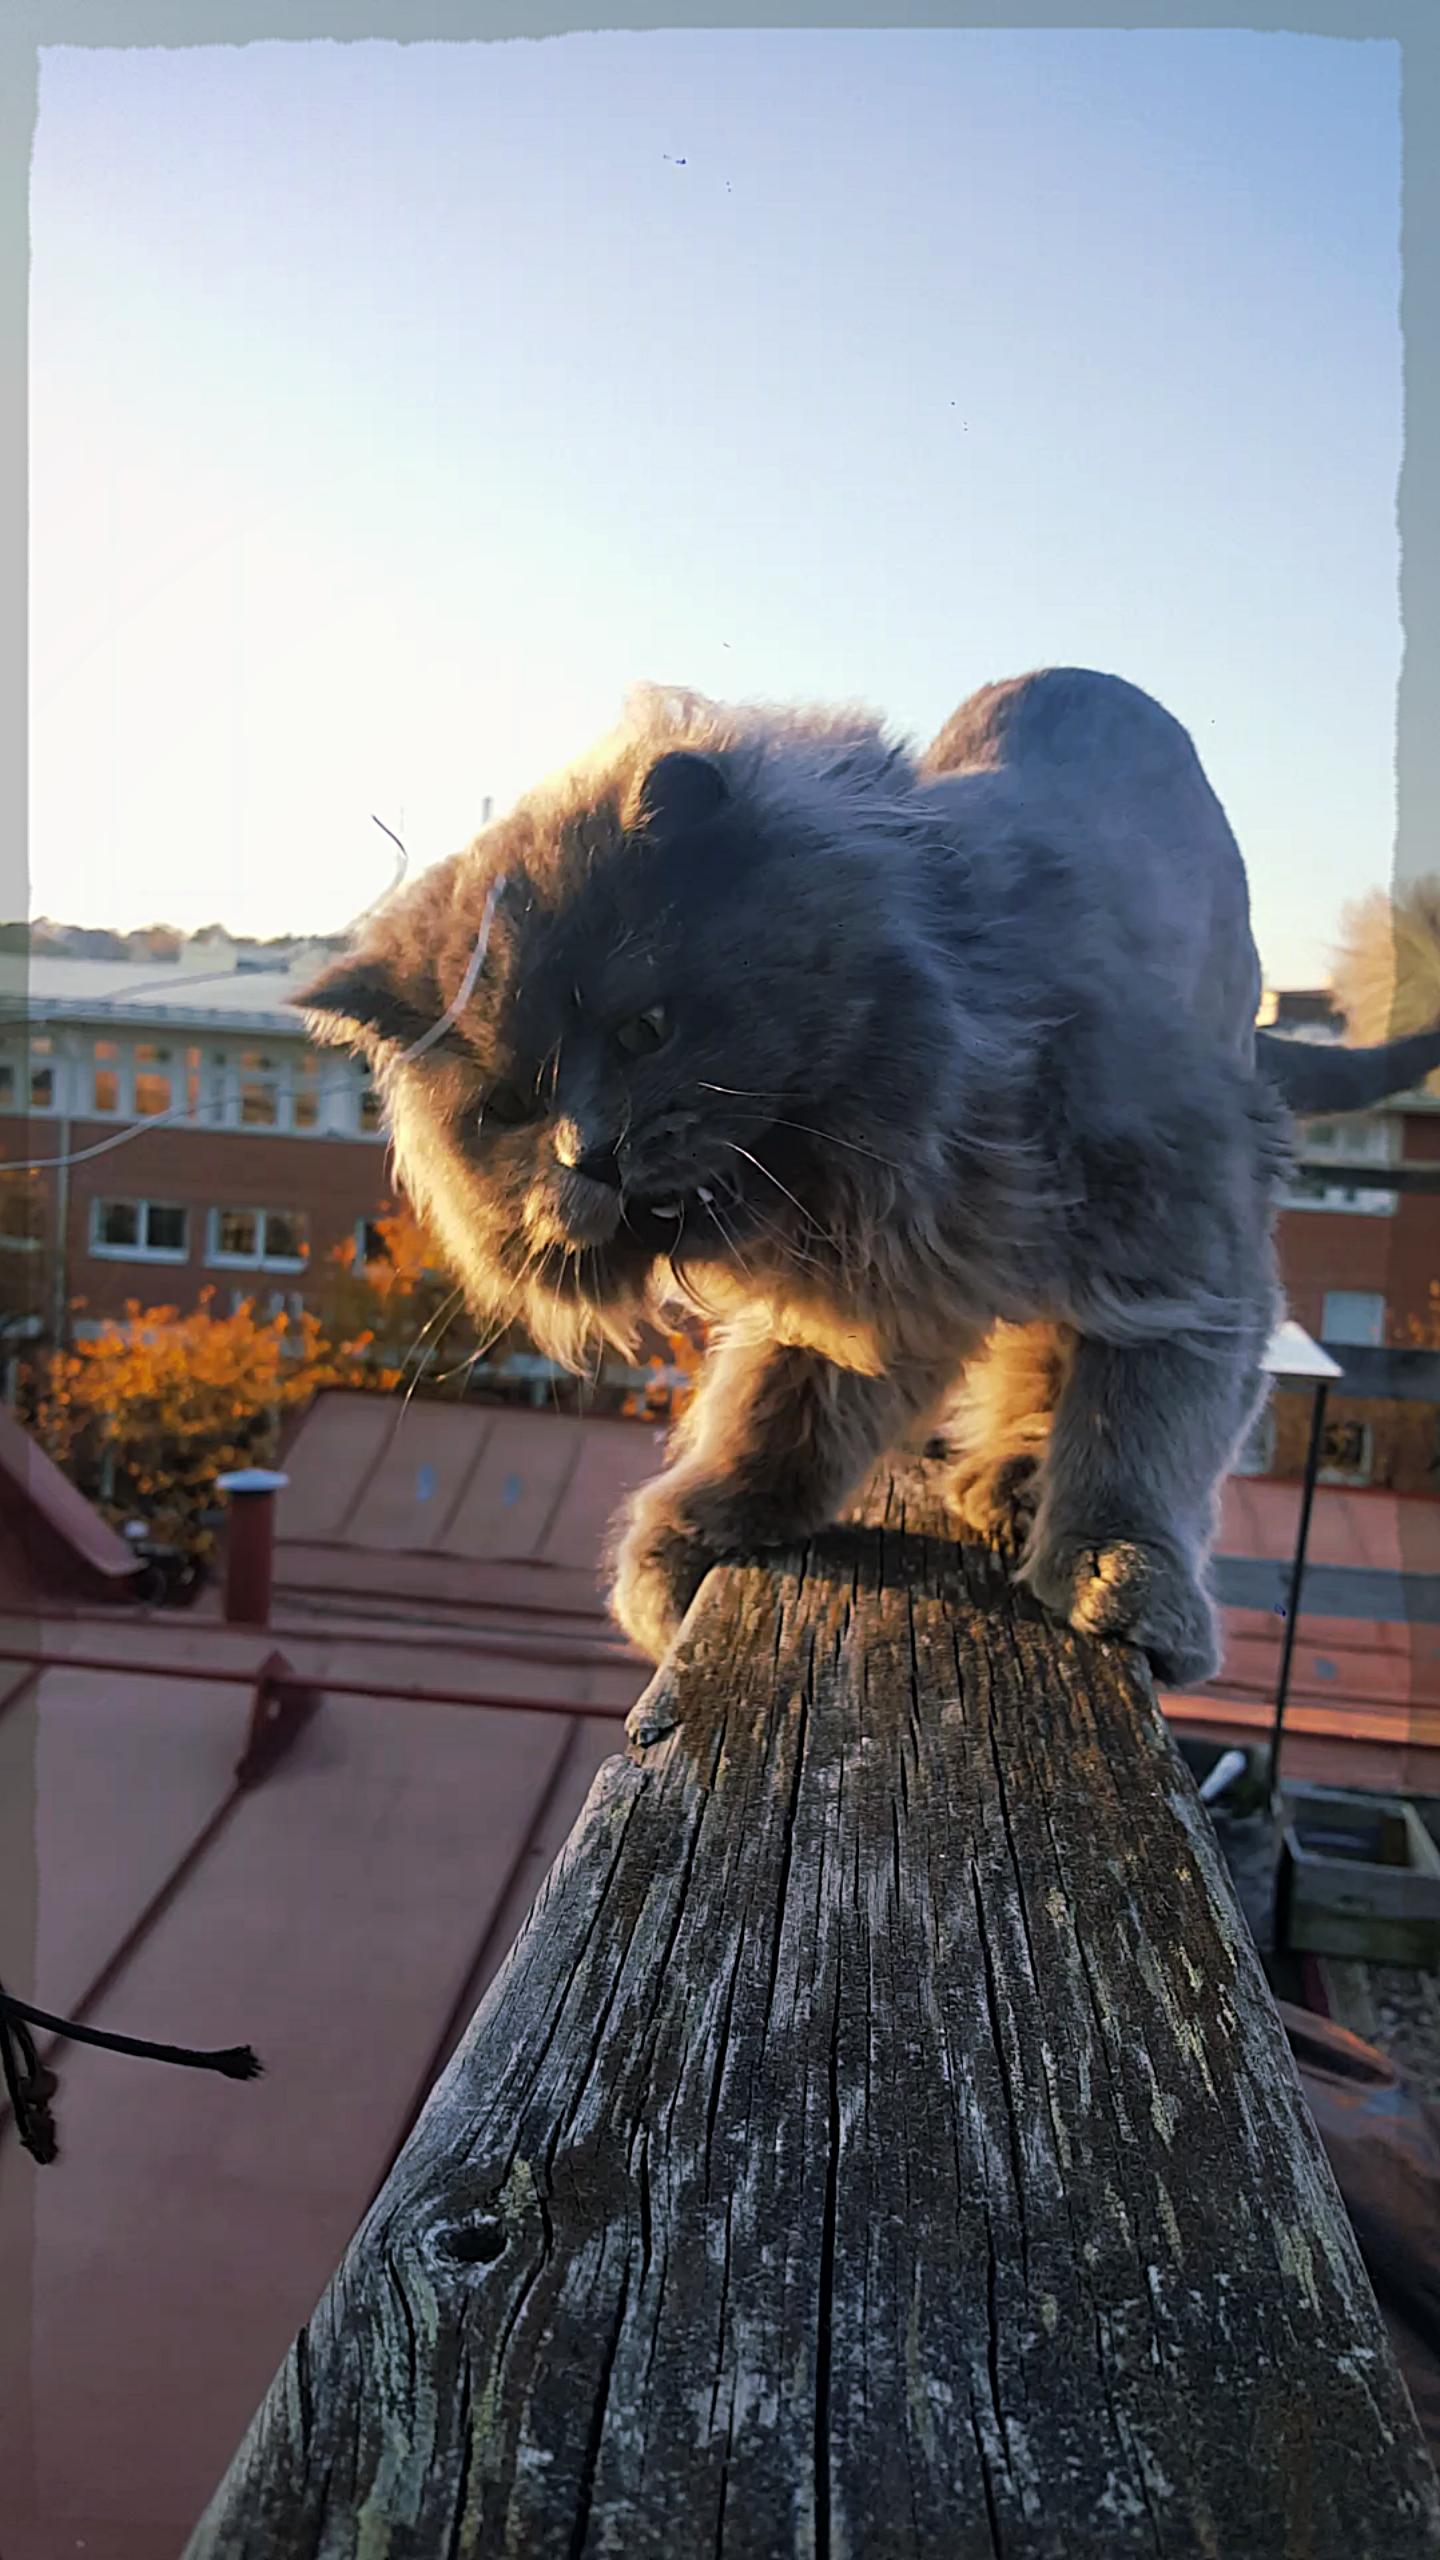 Ruphert - On The Rooftop Terrace